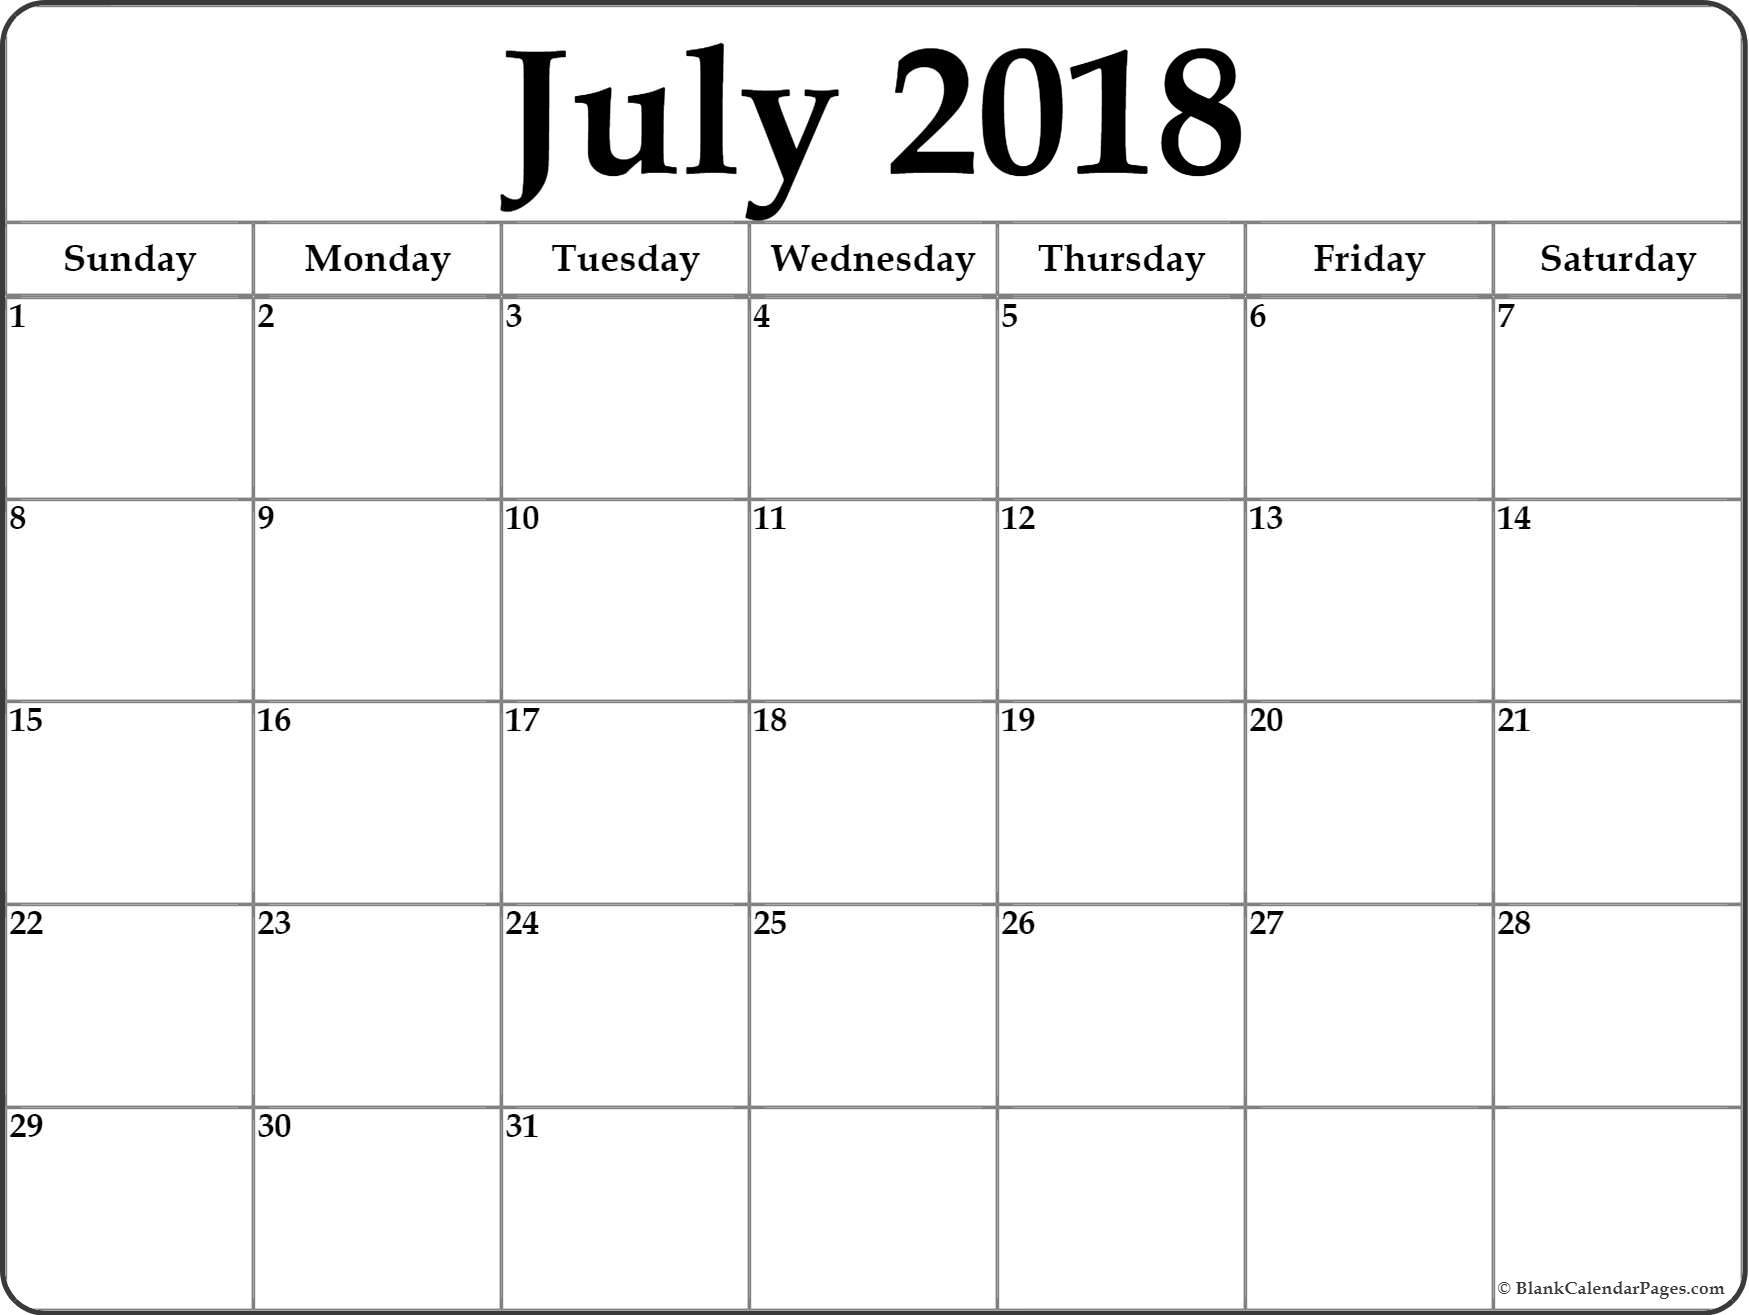 July 2018 Calendar Free Printable Monthly Calendars